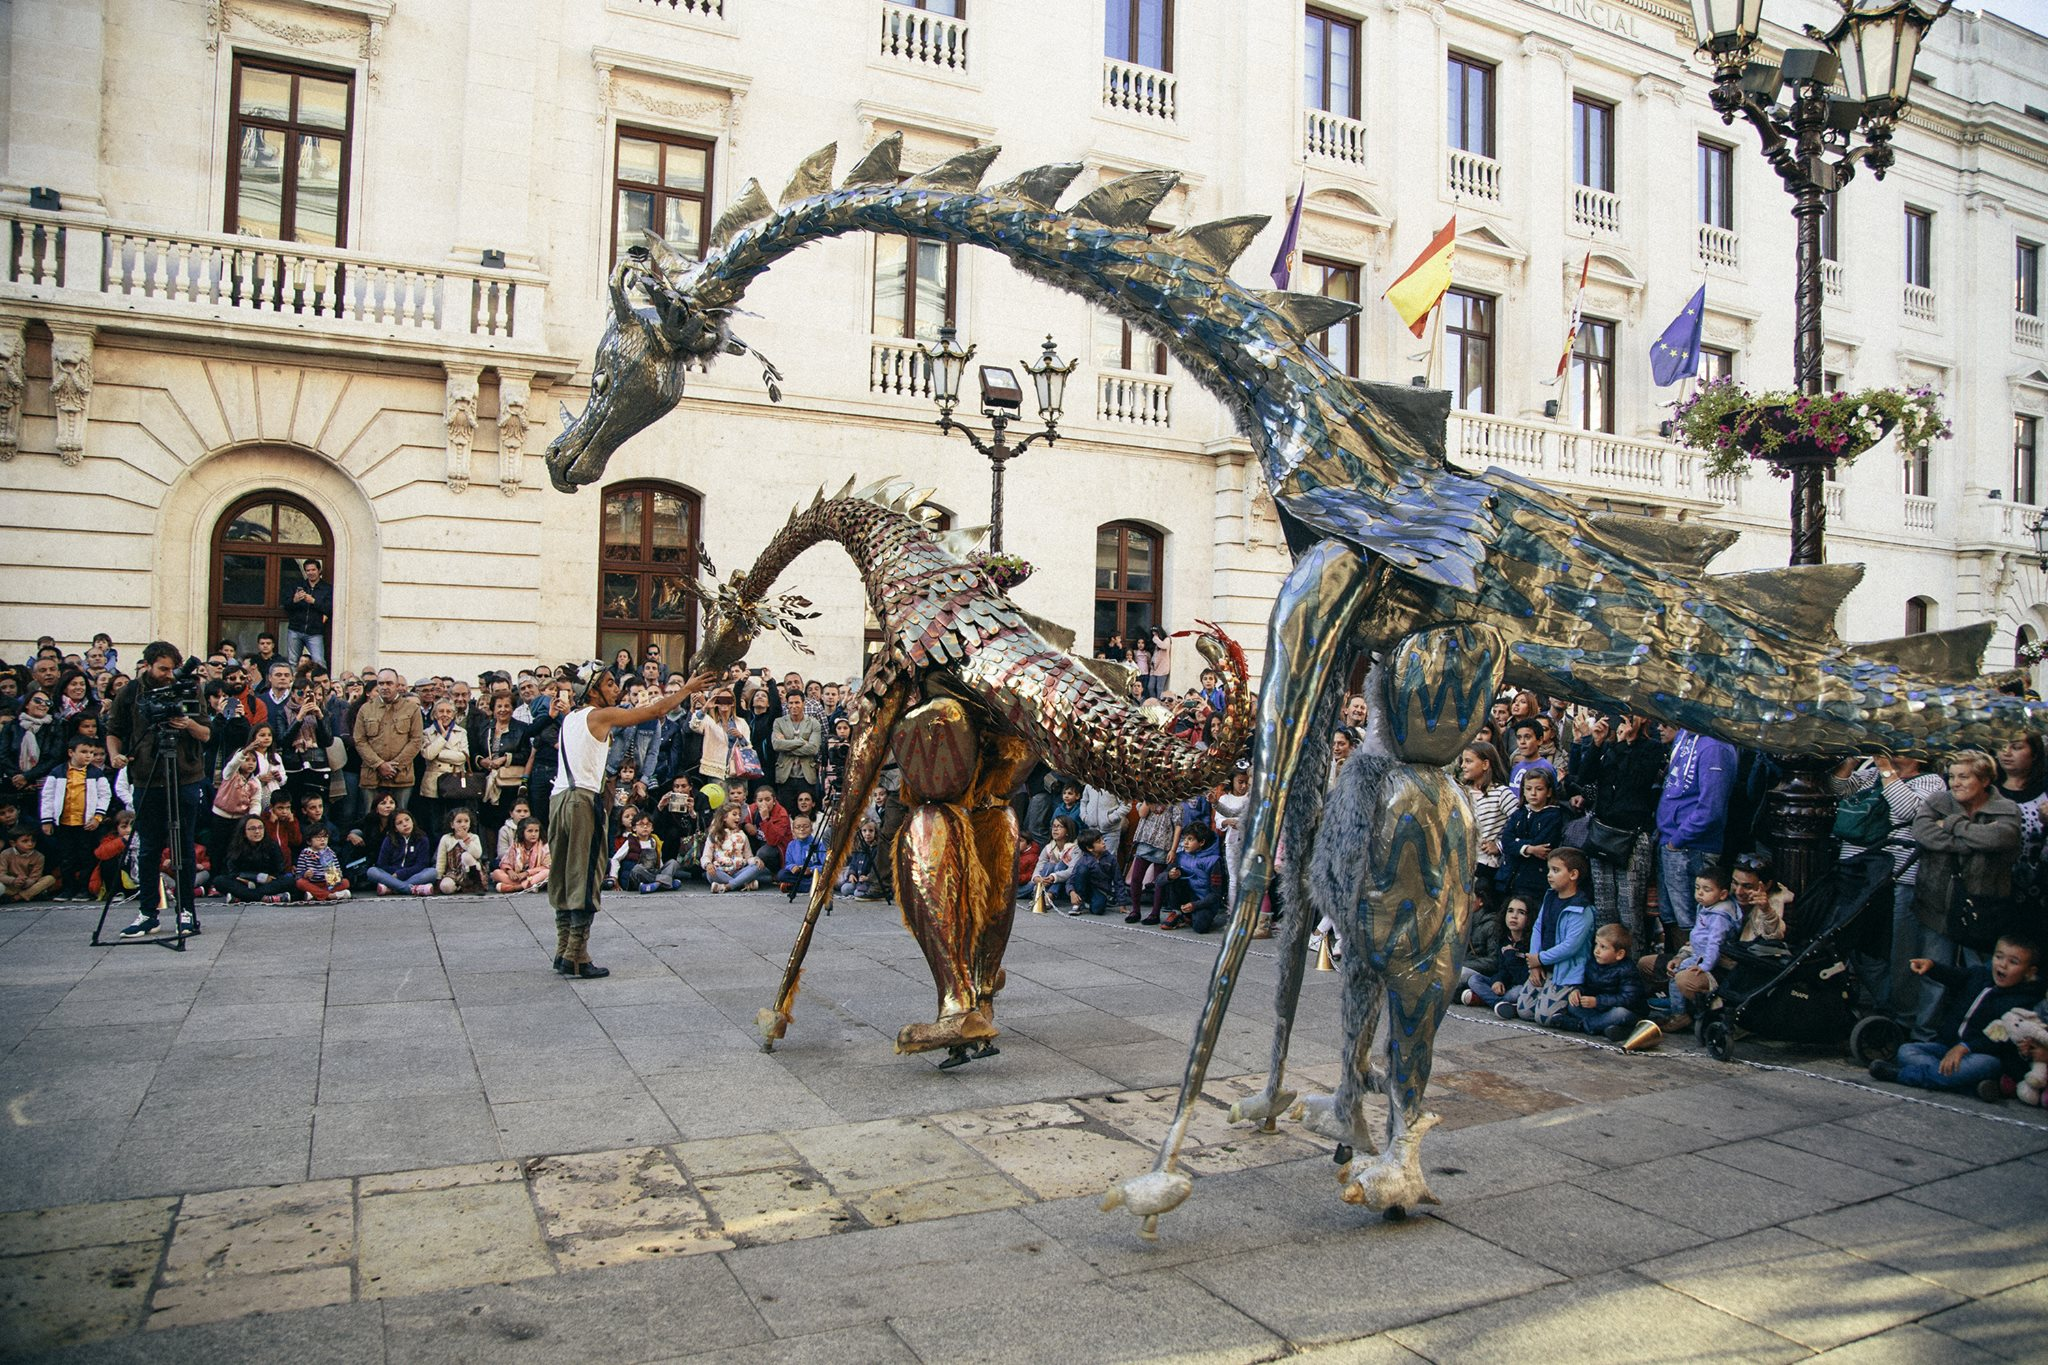 Circo teatro Tiritirantes